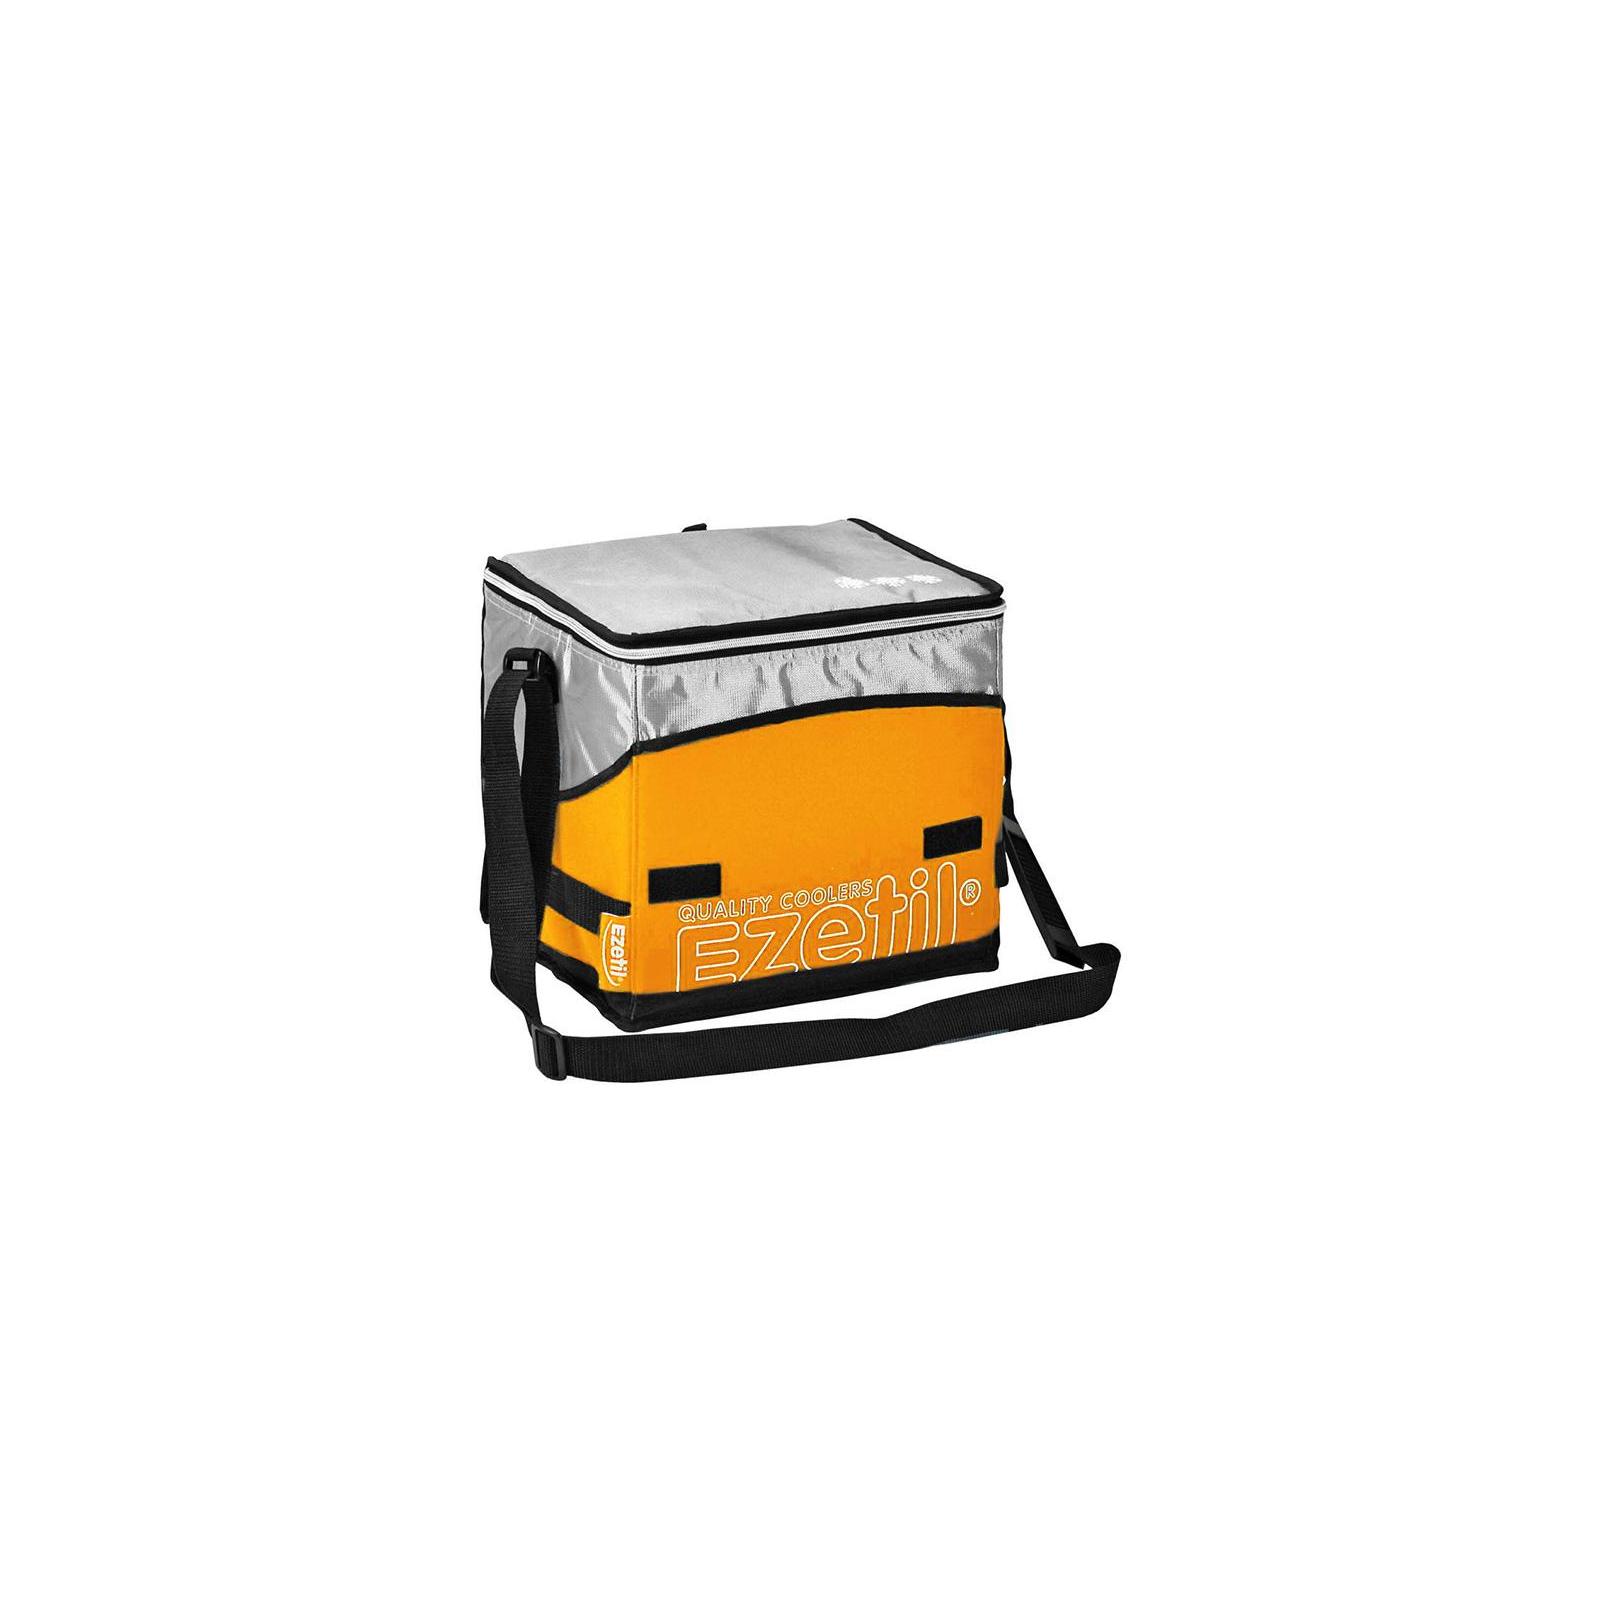 Термосумка Ezetil Extreme 28 л orange (4020716272689ORANGE) изображение 2